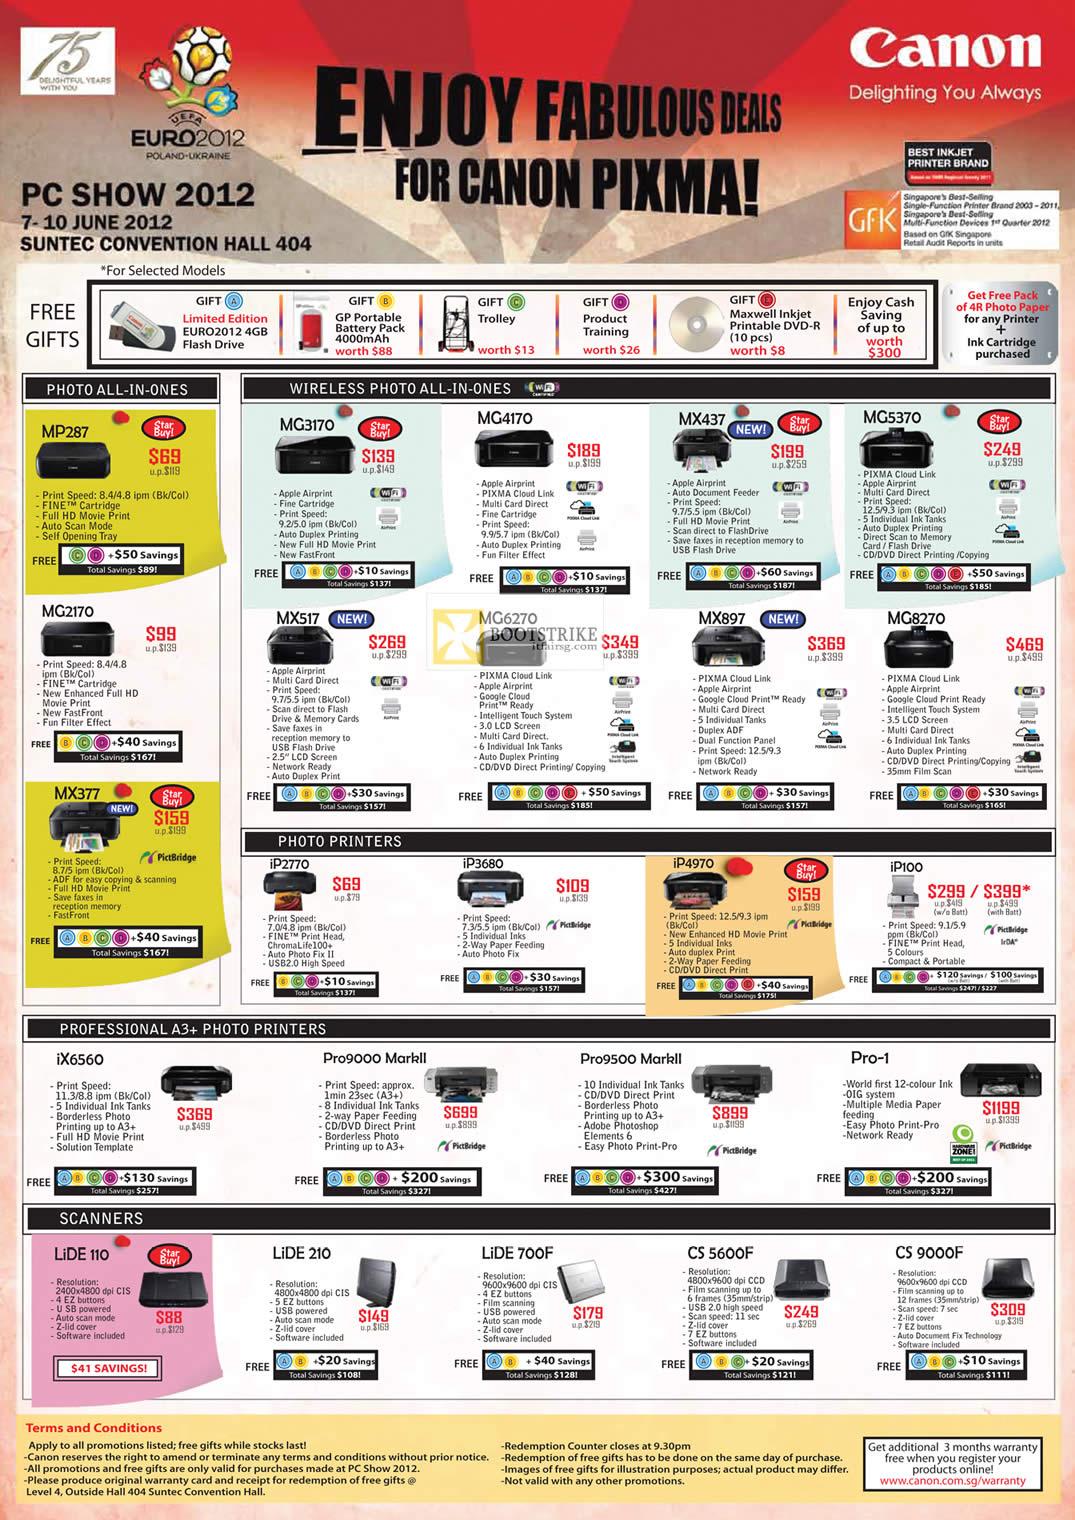 PC SHOW 2012 price list image brochure of Canon Printers Inkjet Pixma MP287, MC2170, MX377, MG3170, MG4170, MX437, MG5370, MG8270, MX897, MG6270, Scanners Lide